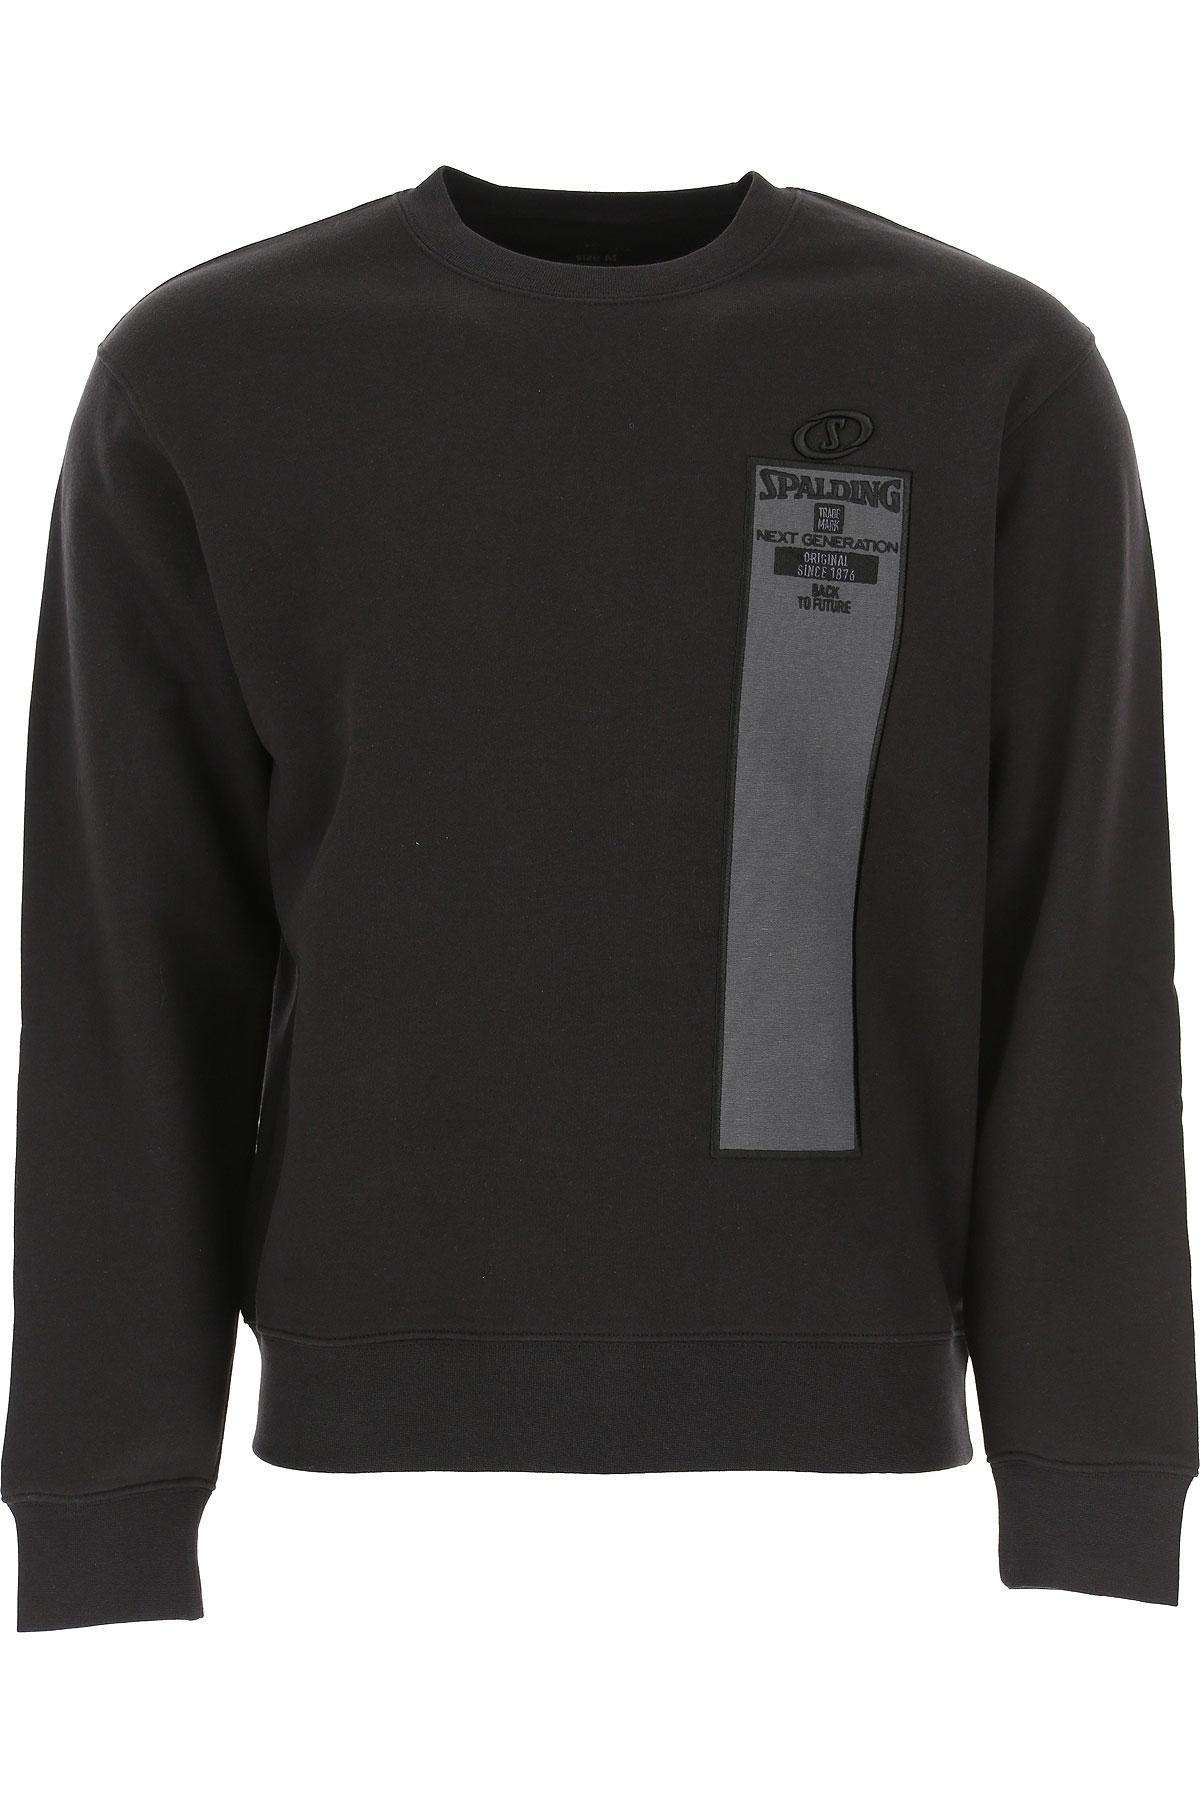 Spalding Sweatshirt for Men On Sale, Black, Cotton, 2019, L XL XXL